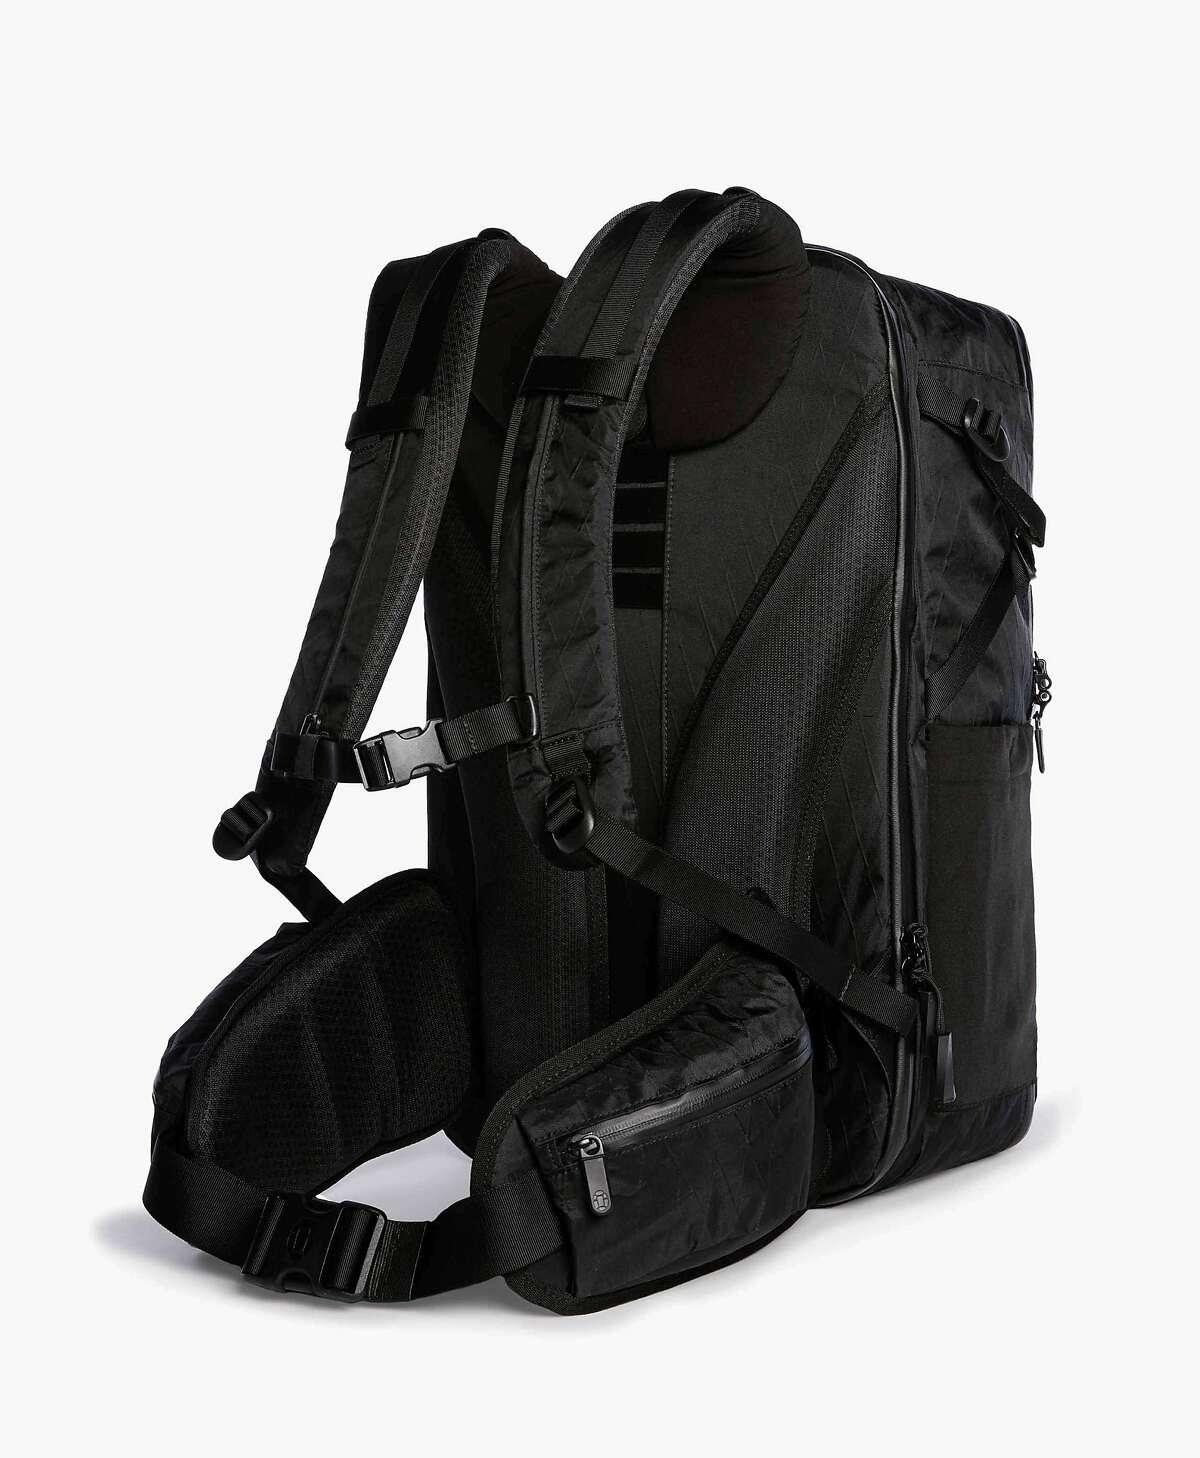 The Outbreaker backpack by Tortuga Backpacks.